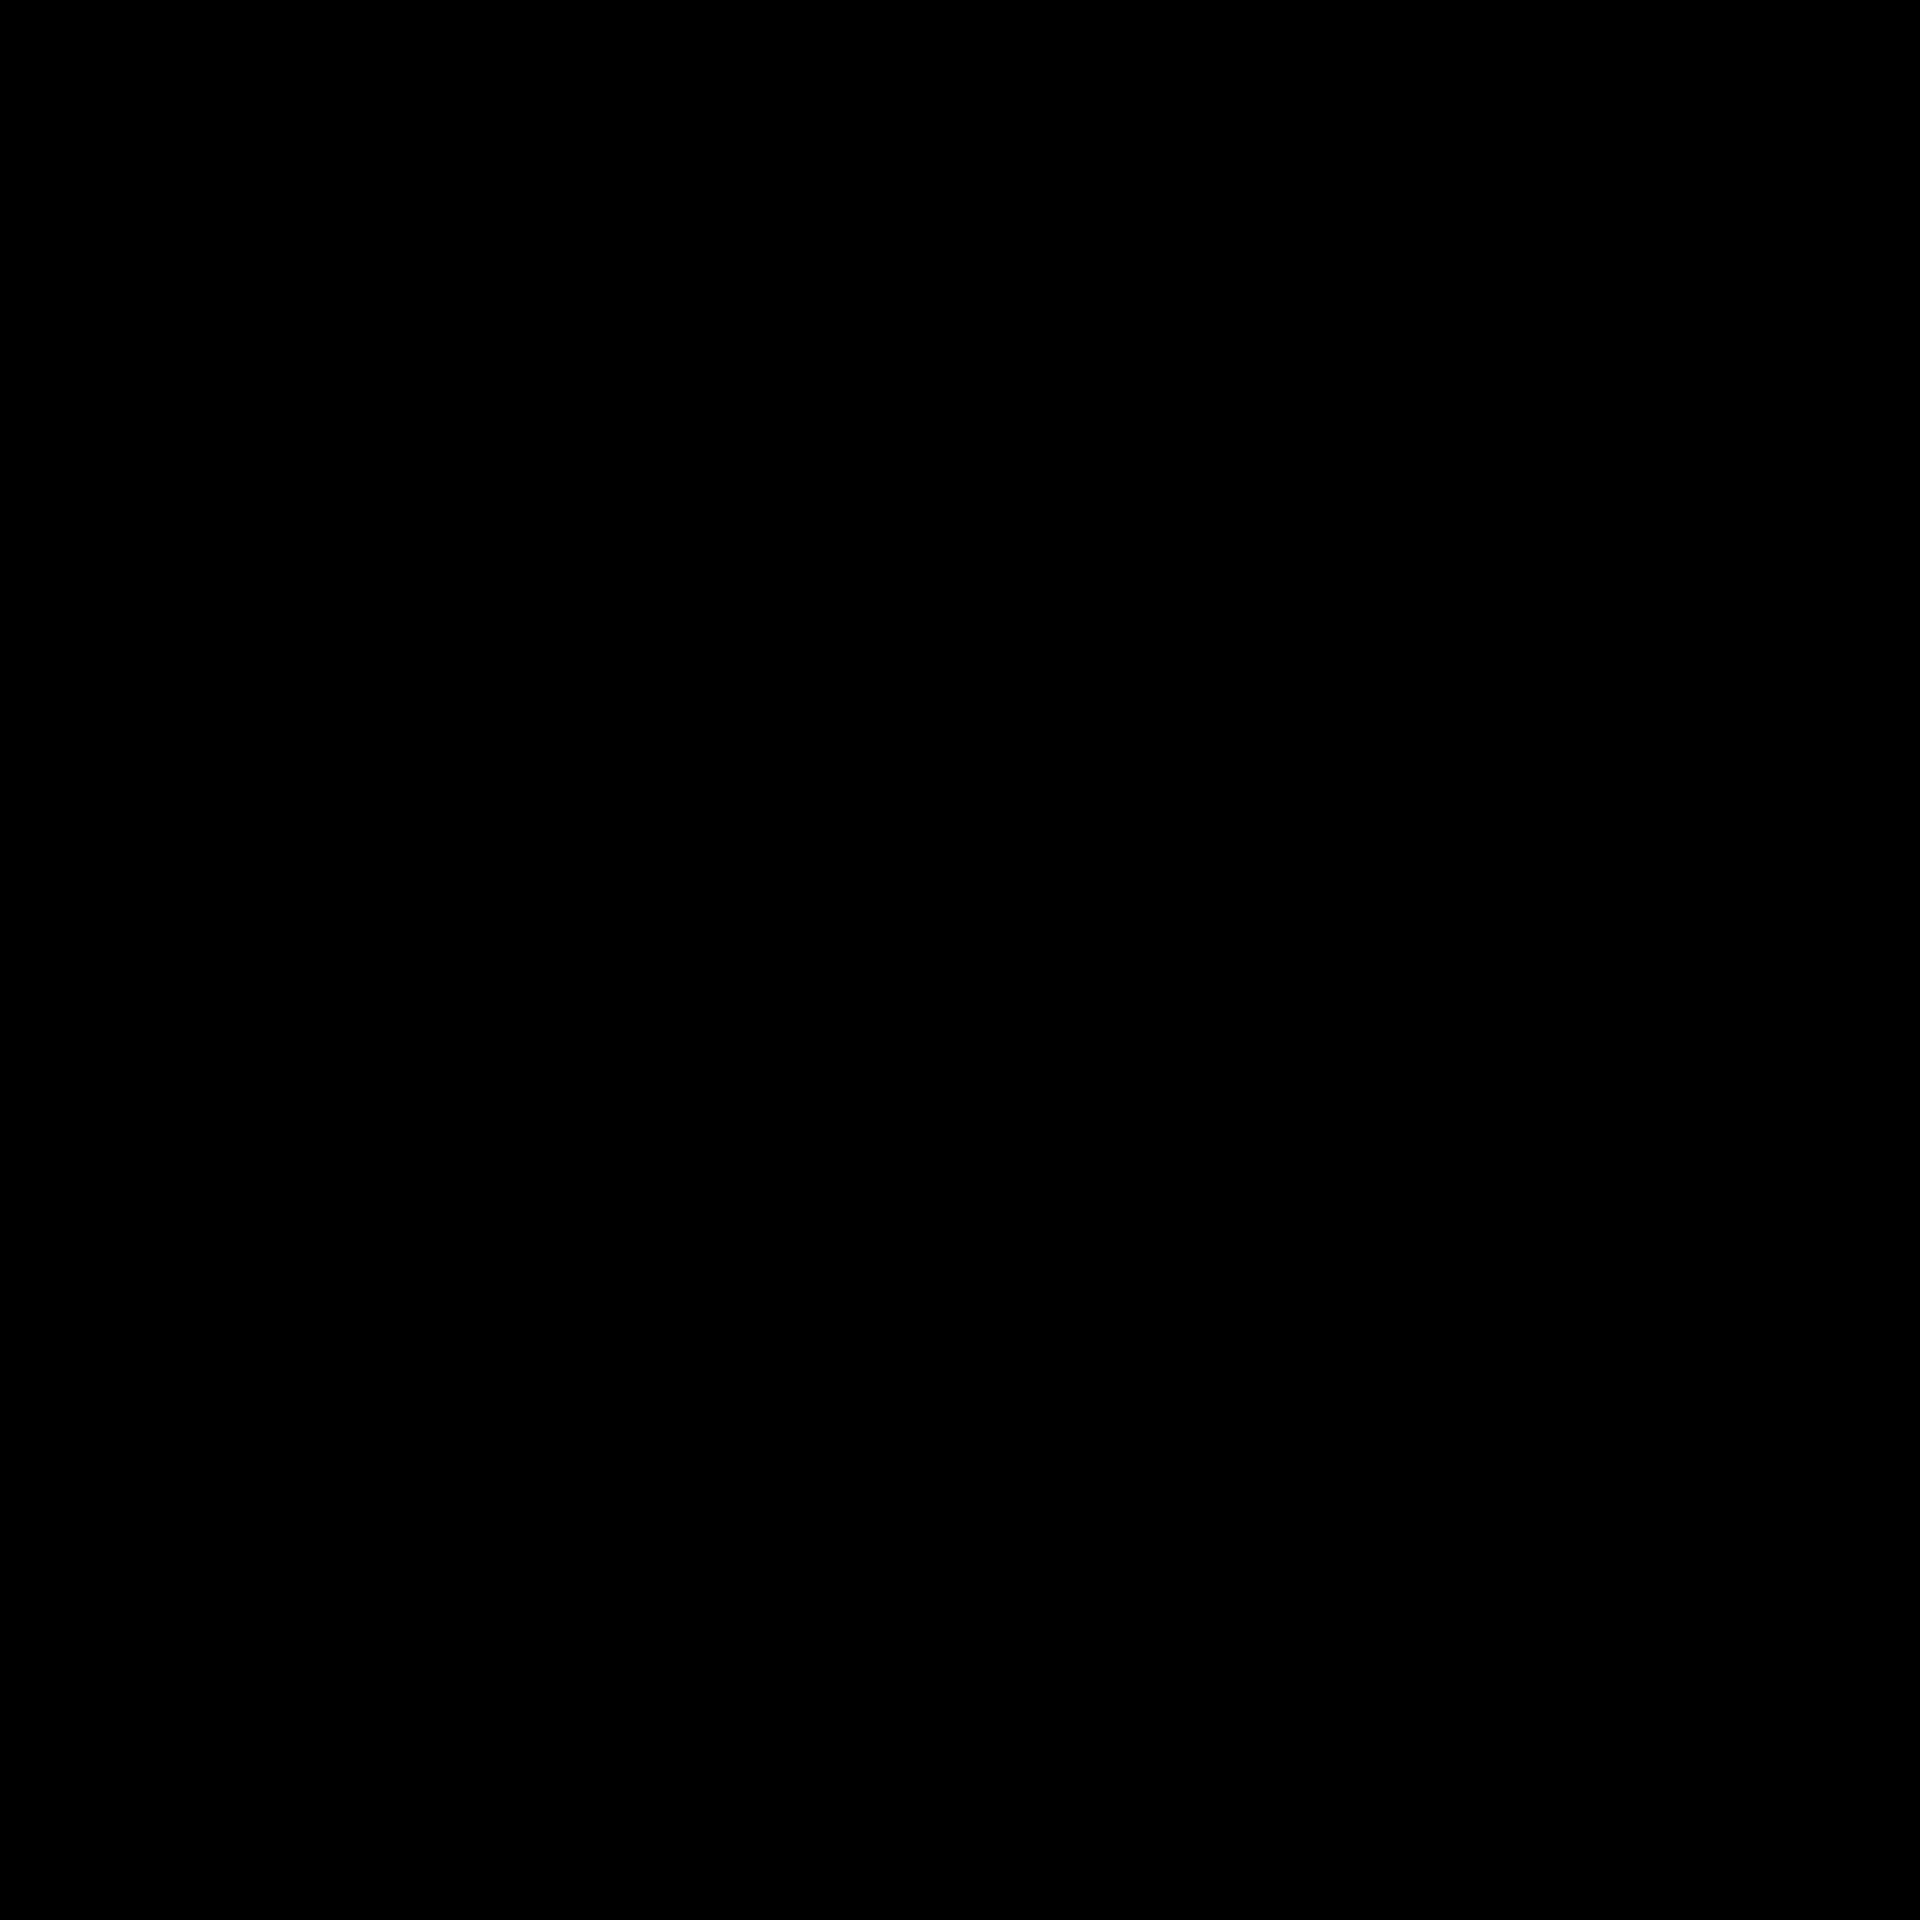 atom-1341364_1920